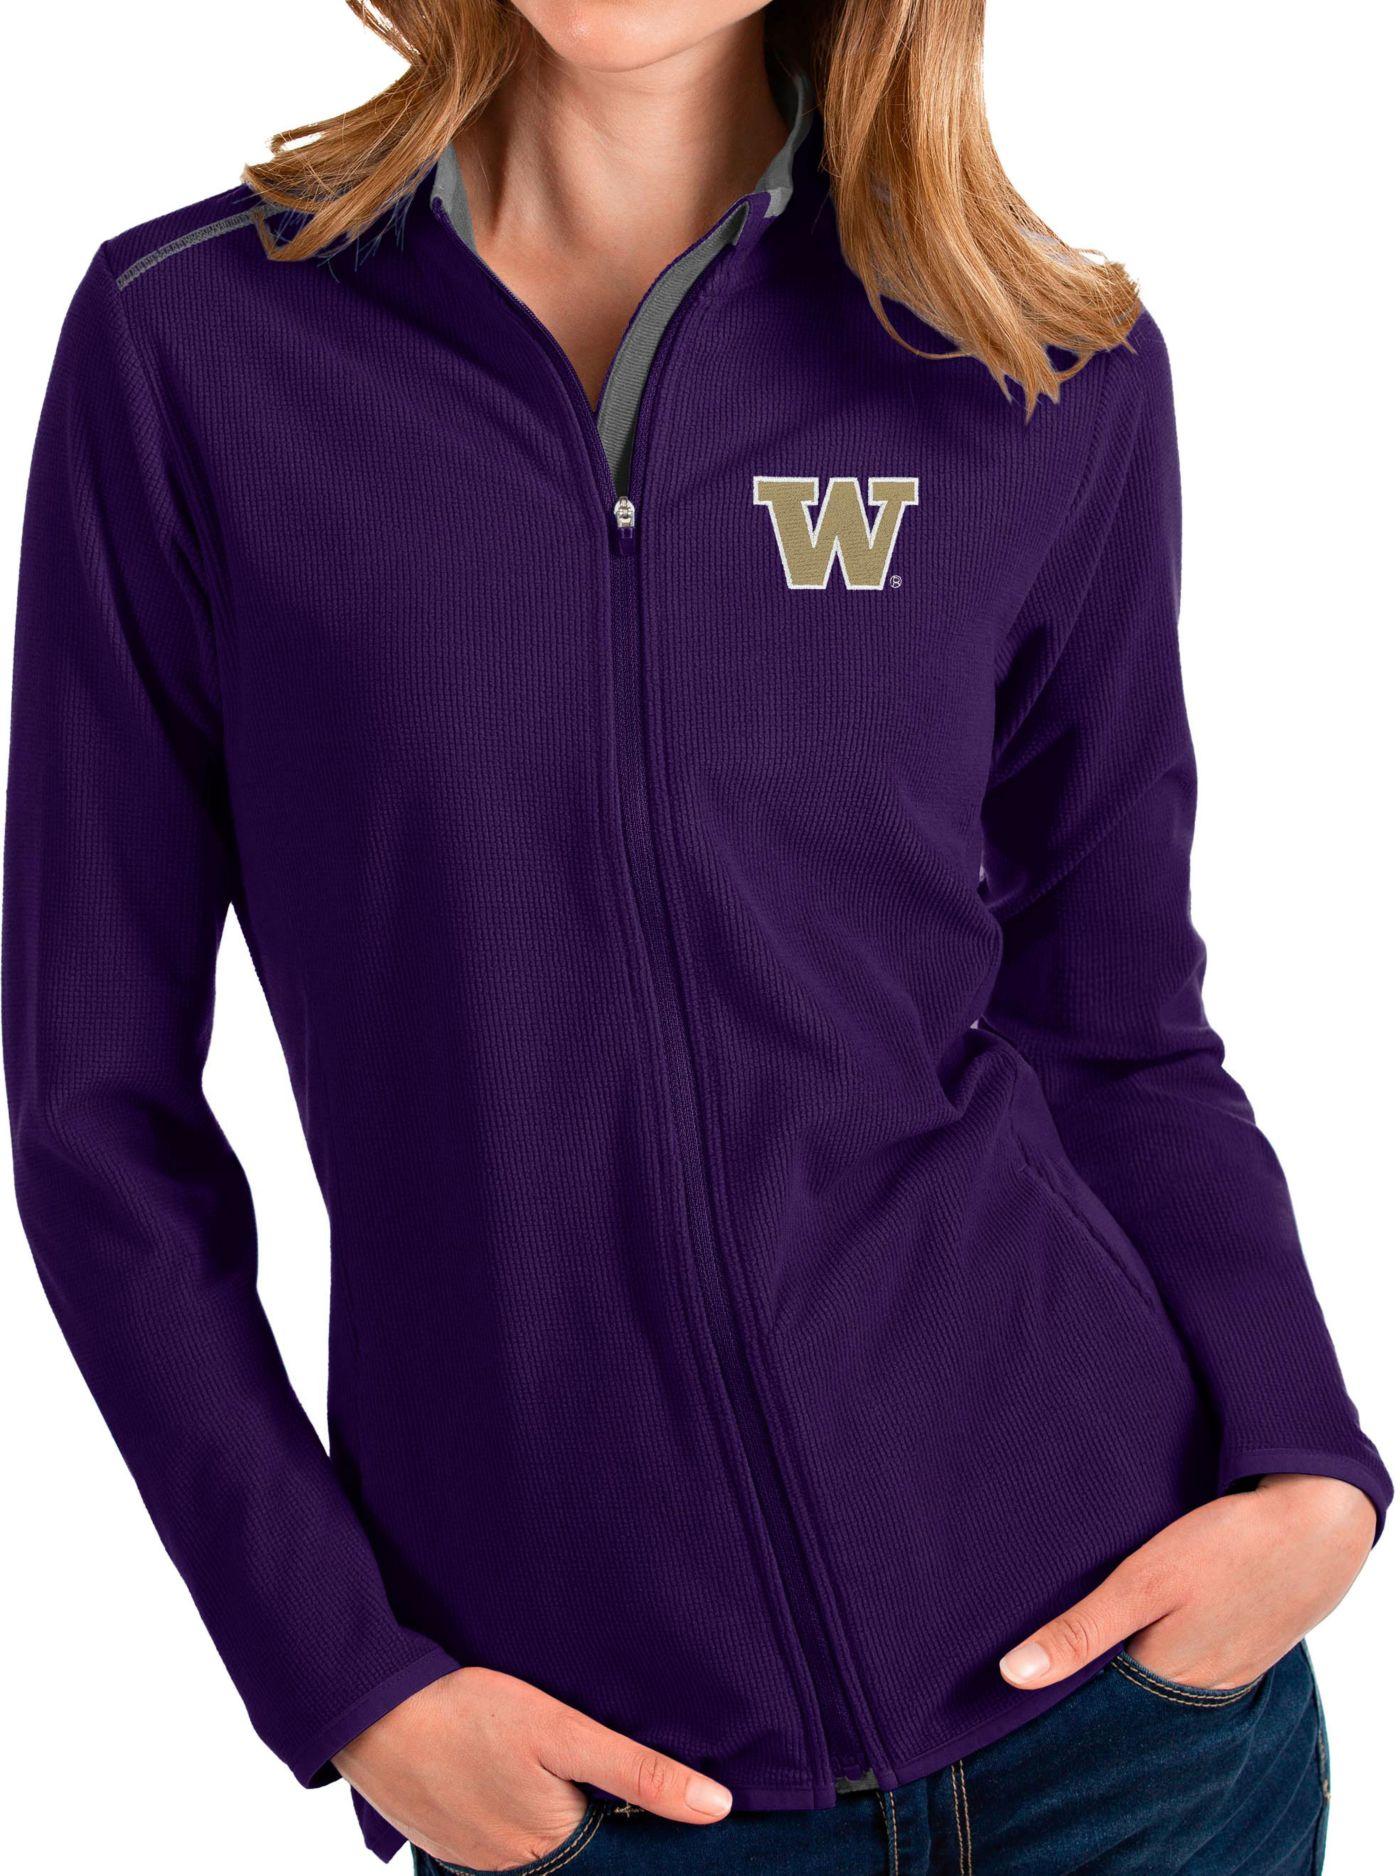 Antigua Women's Washington Huskies Purple Glacier Full-Zip Jacket